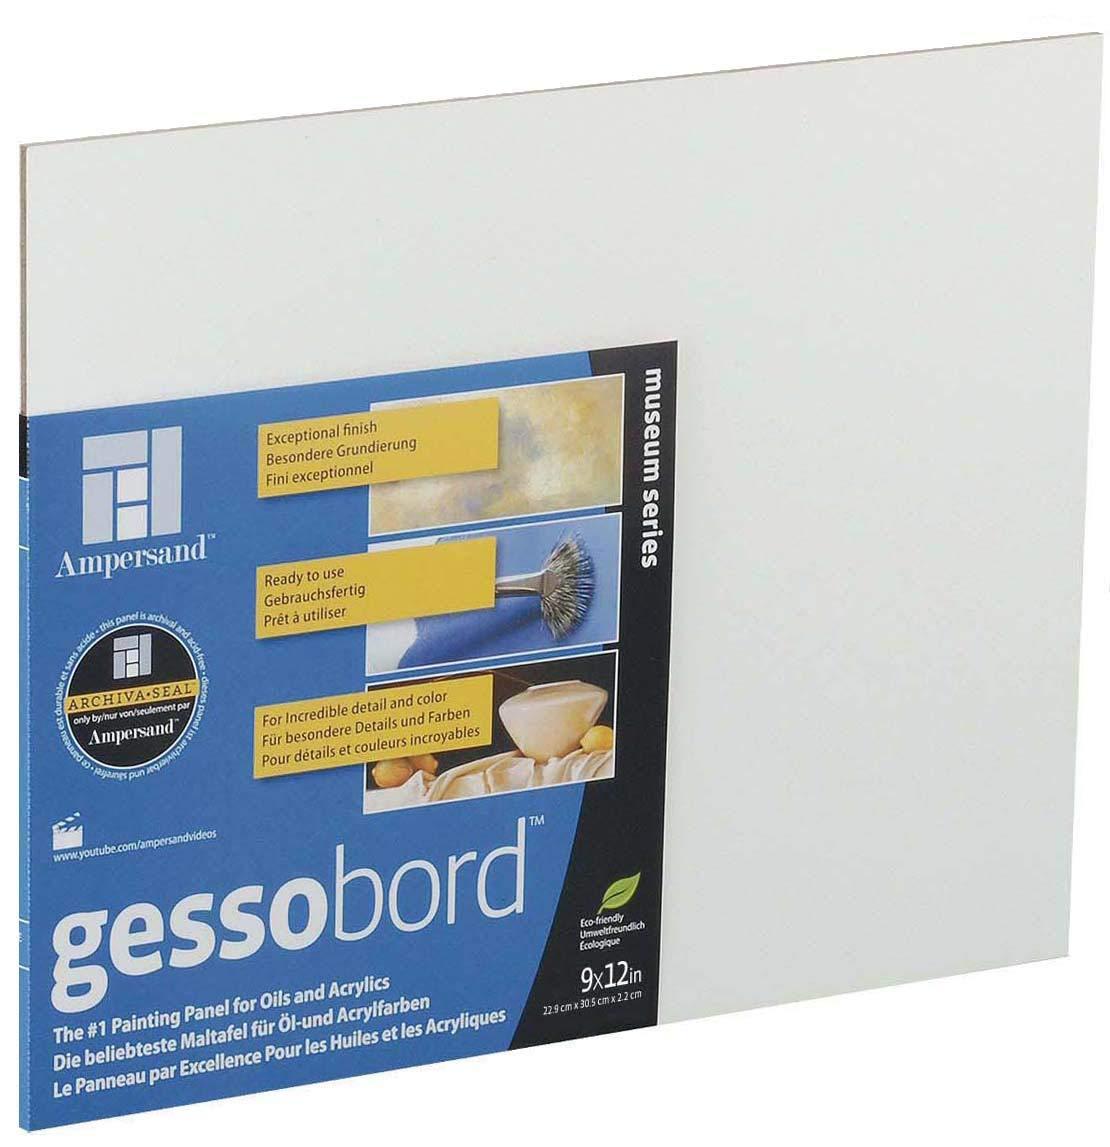 Ampersand : Gessobord Panel : Uncradled 3mm : 11x14in Premium Art Brands Ltd